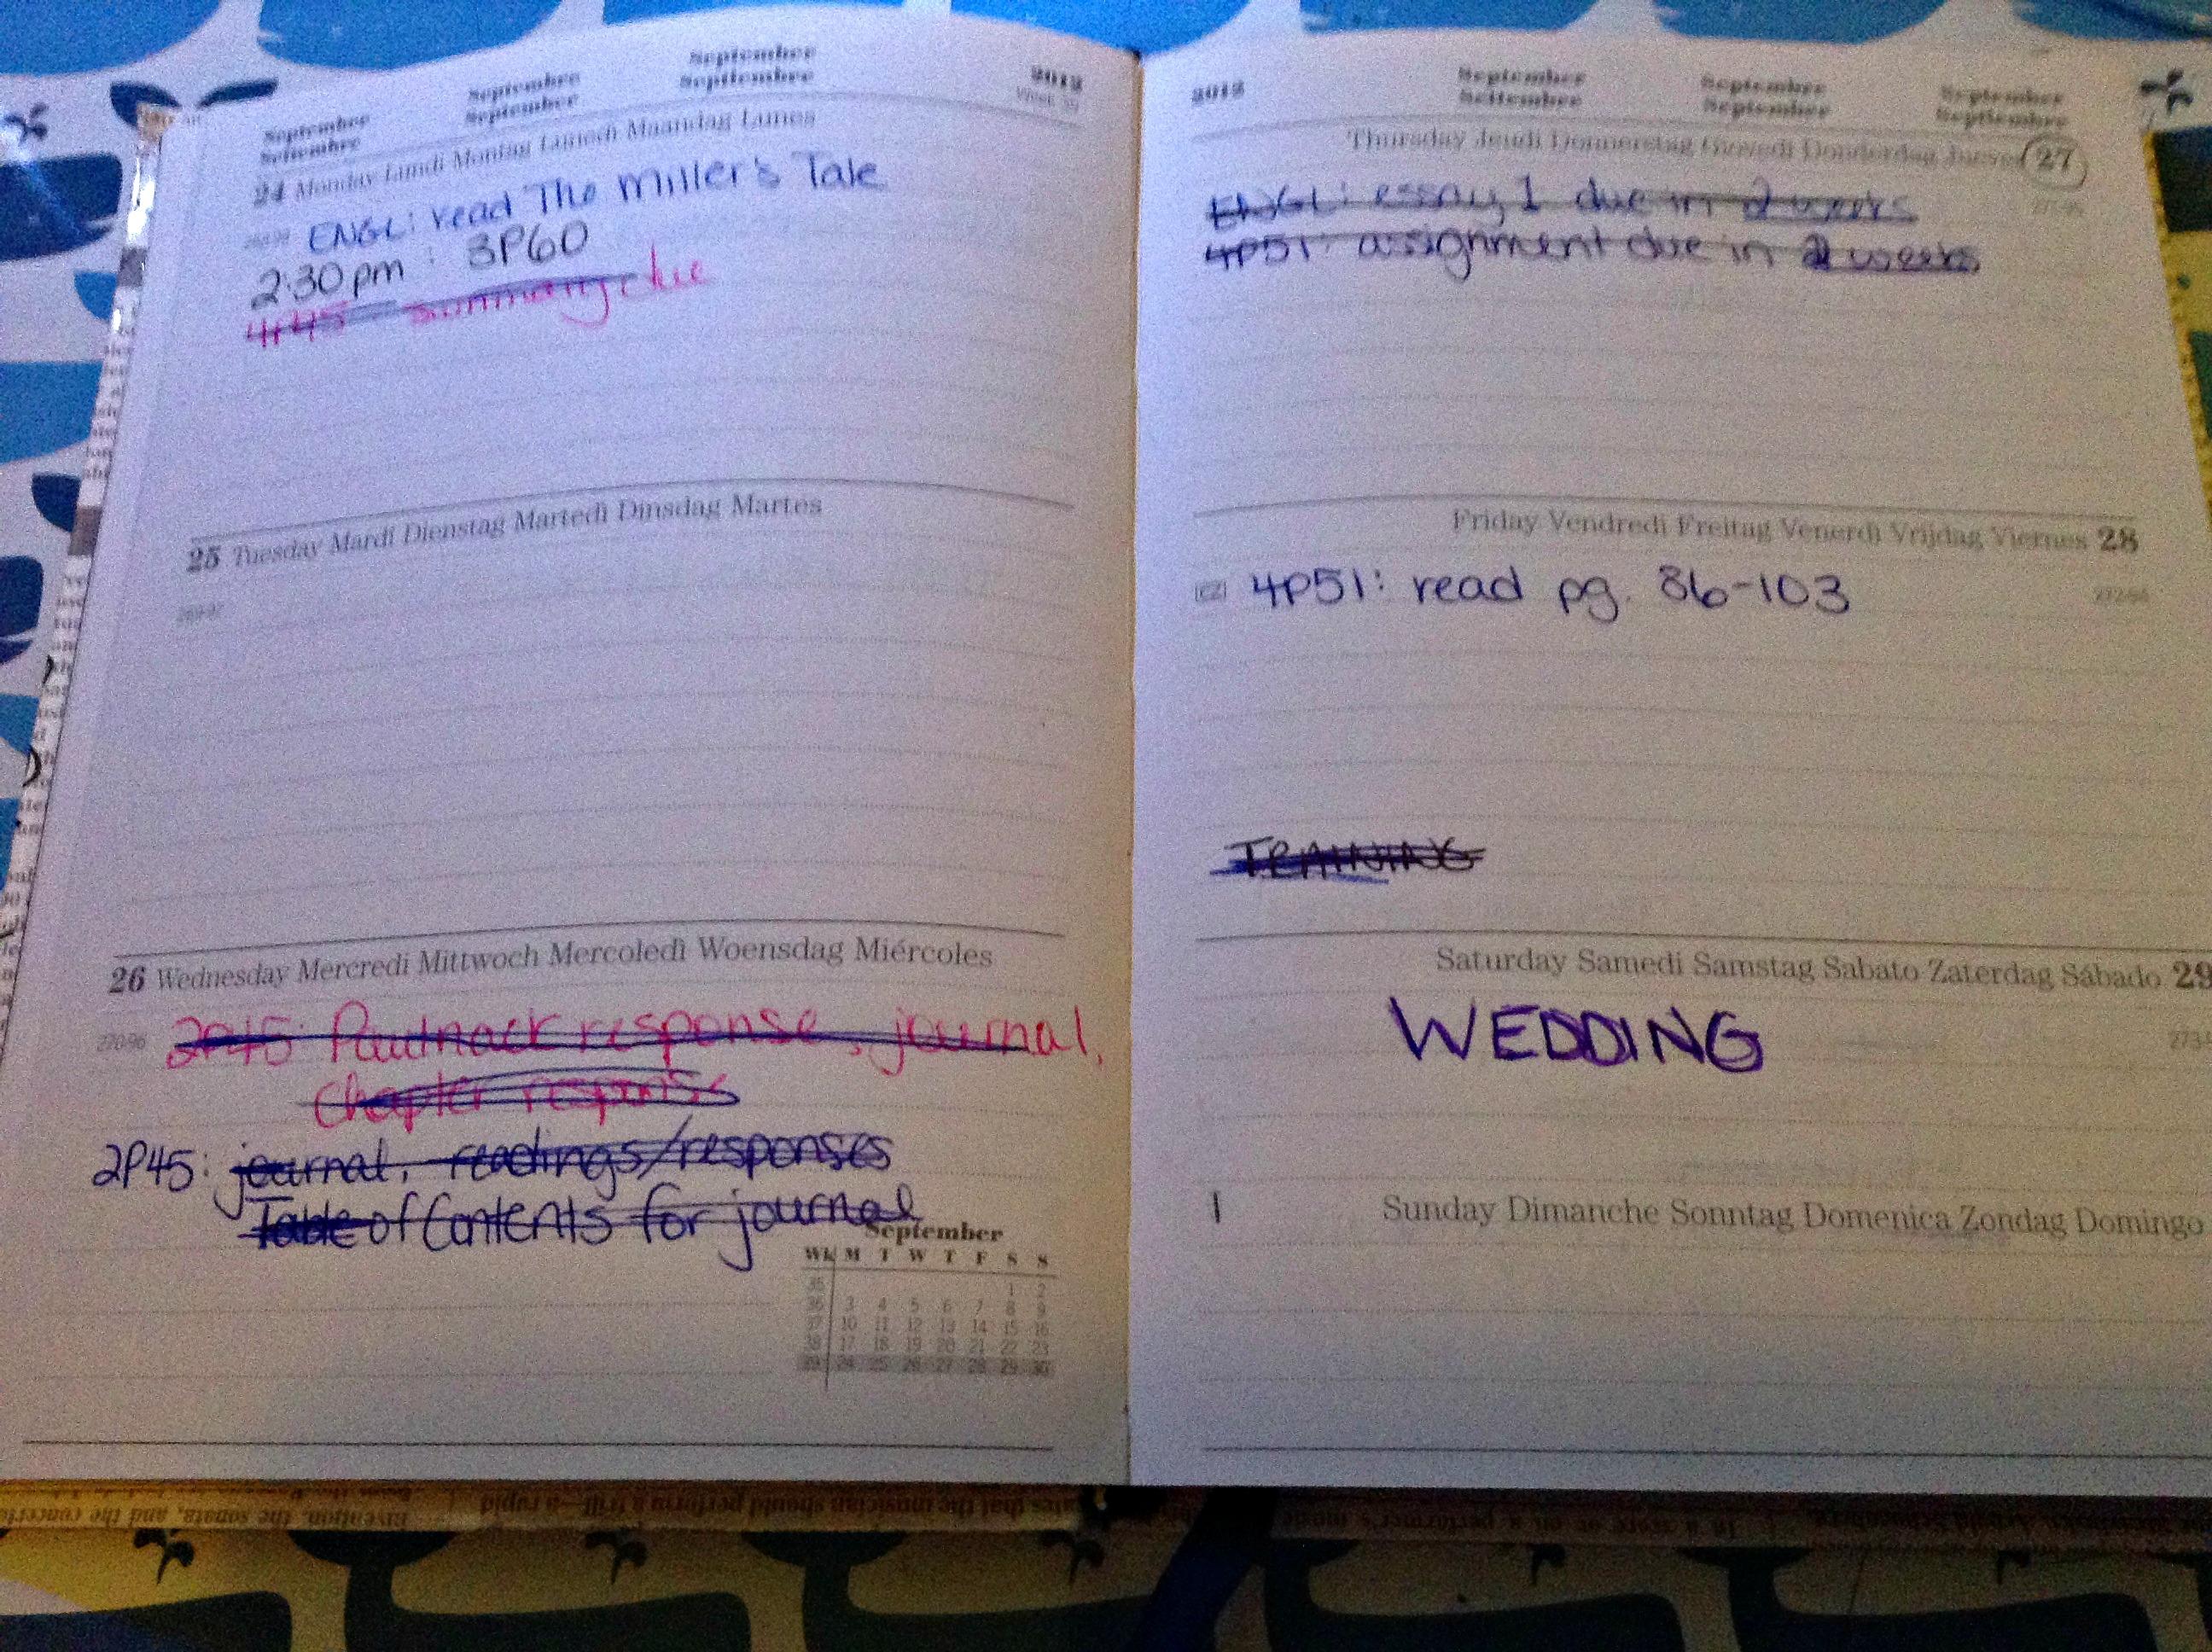 Organize Your School Planner with GagenGirls.com